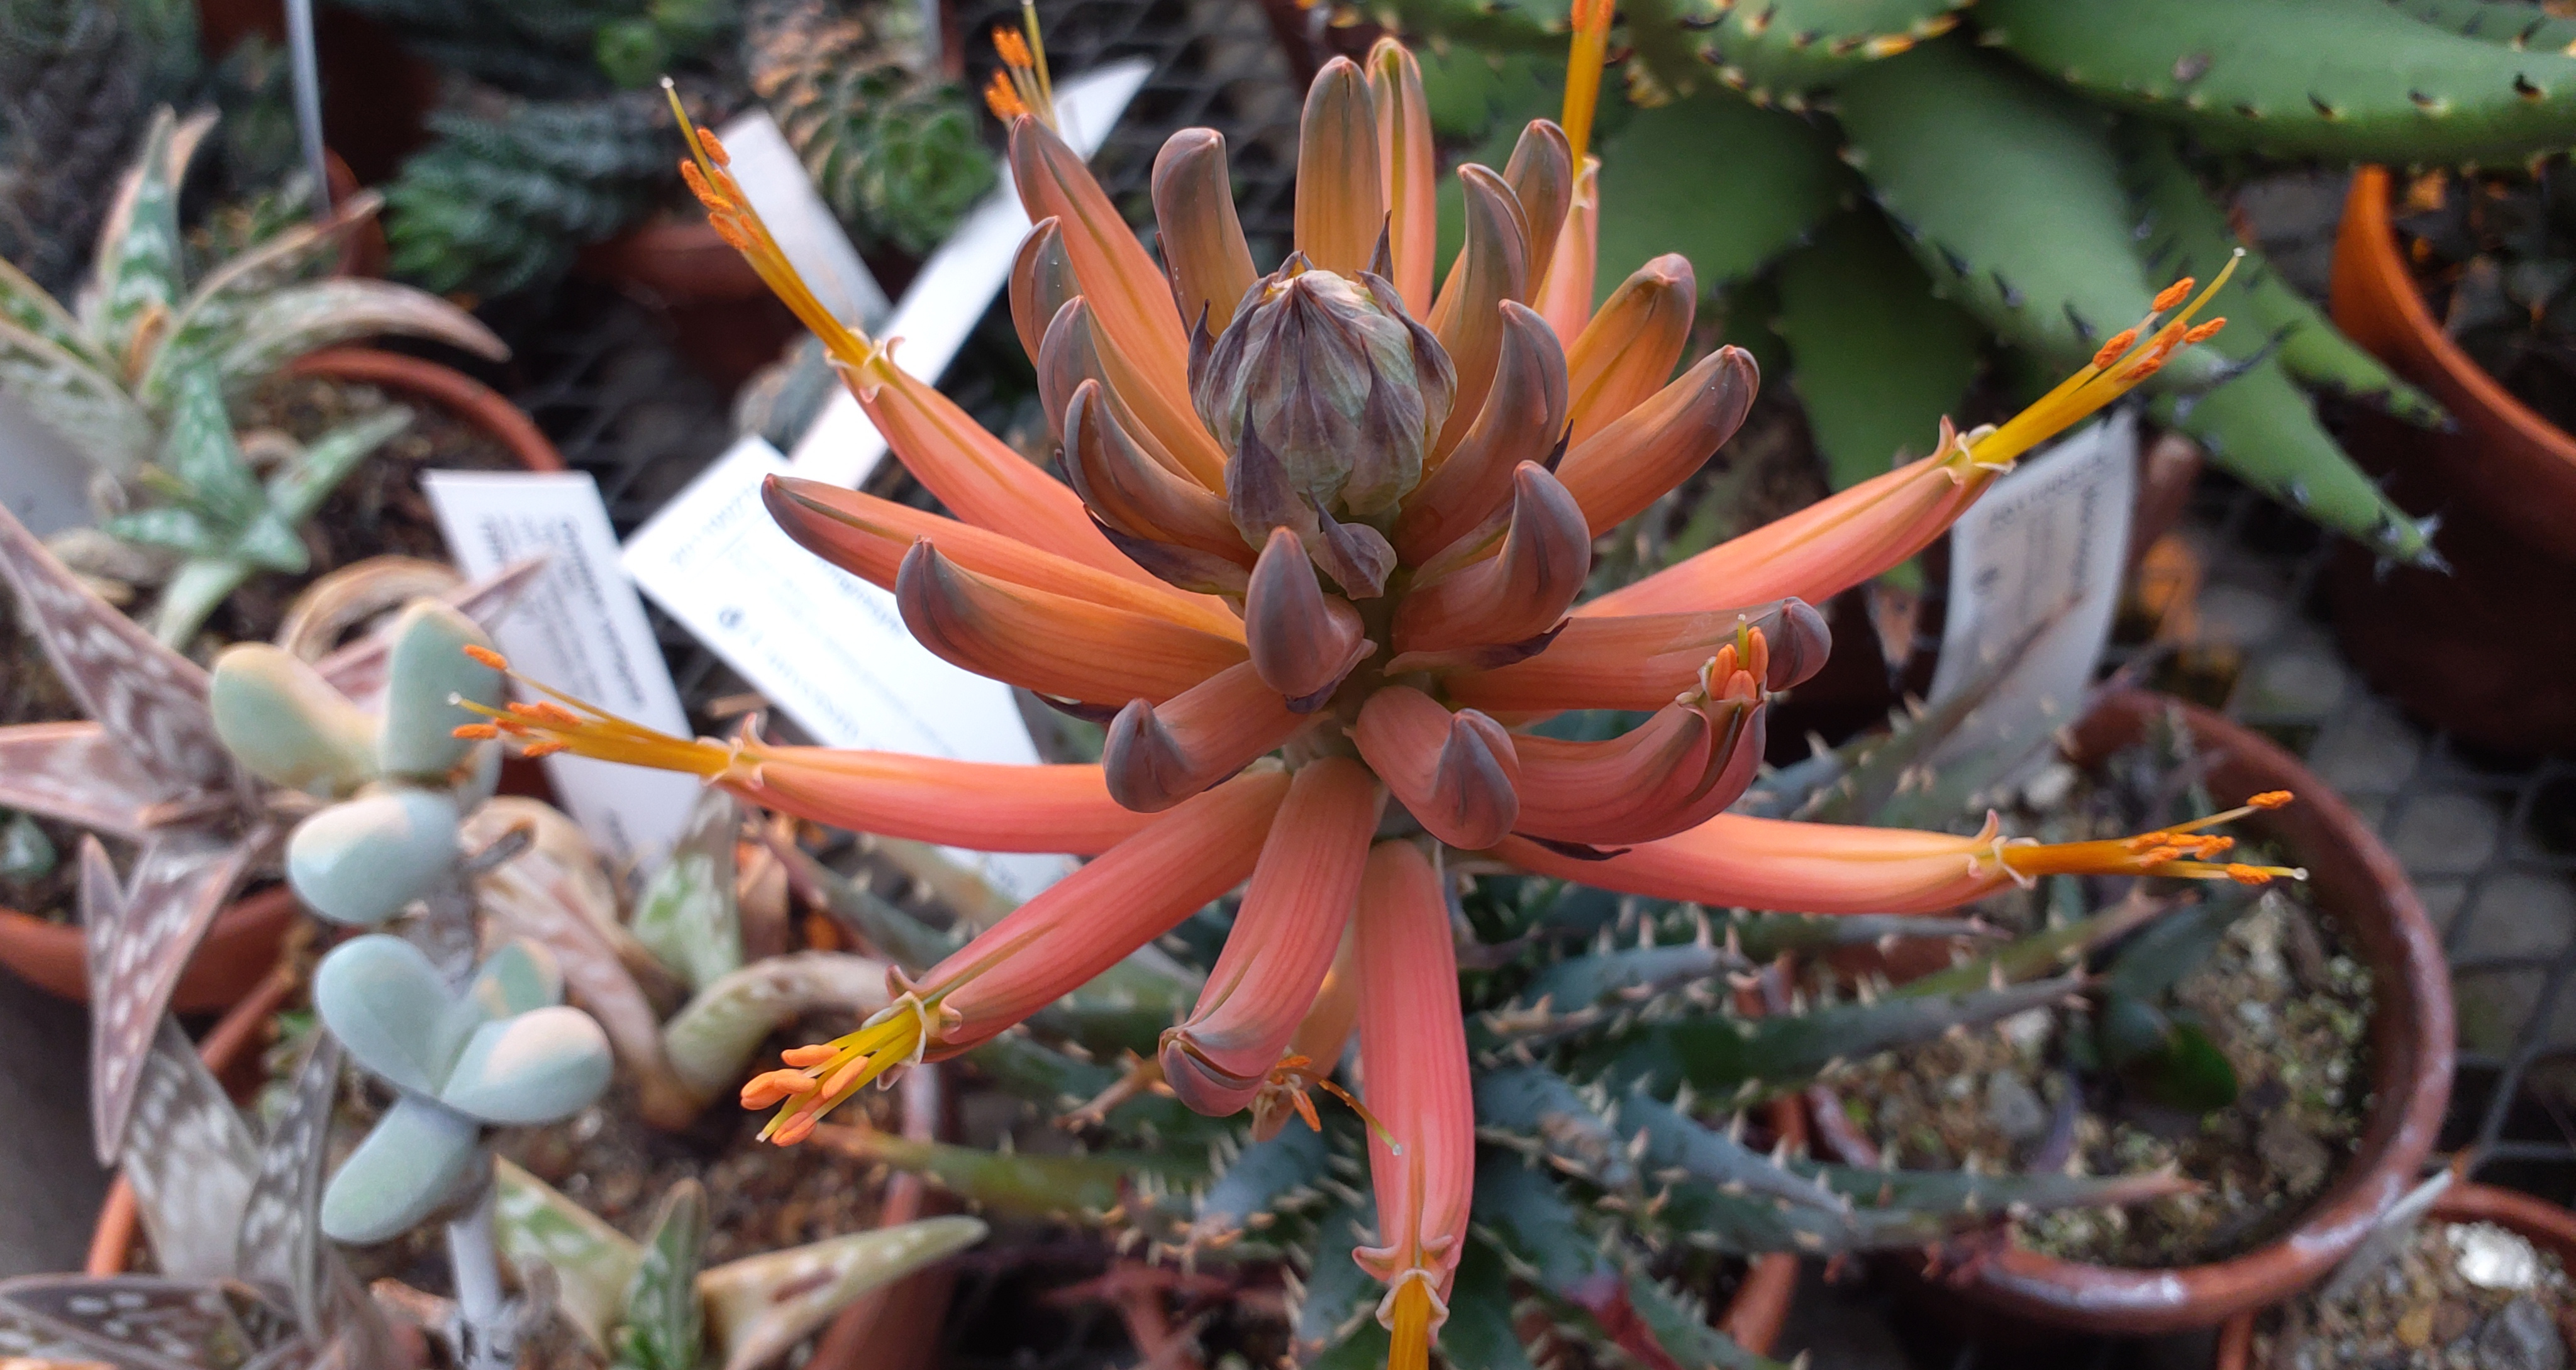 Aloe longistyla blooming this week